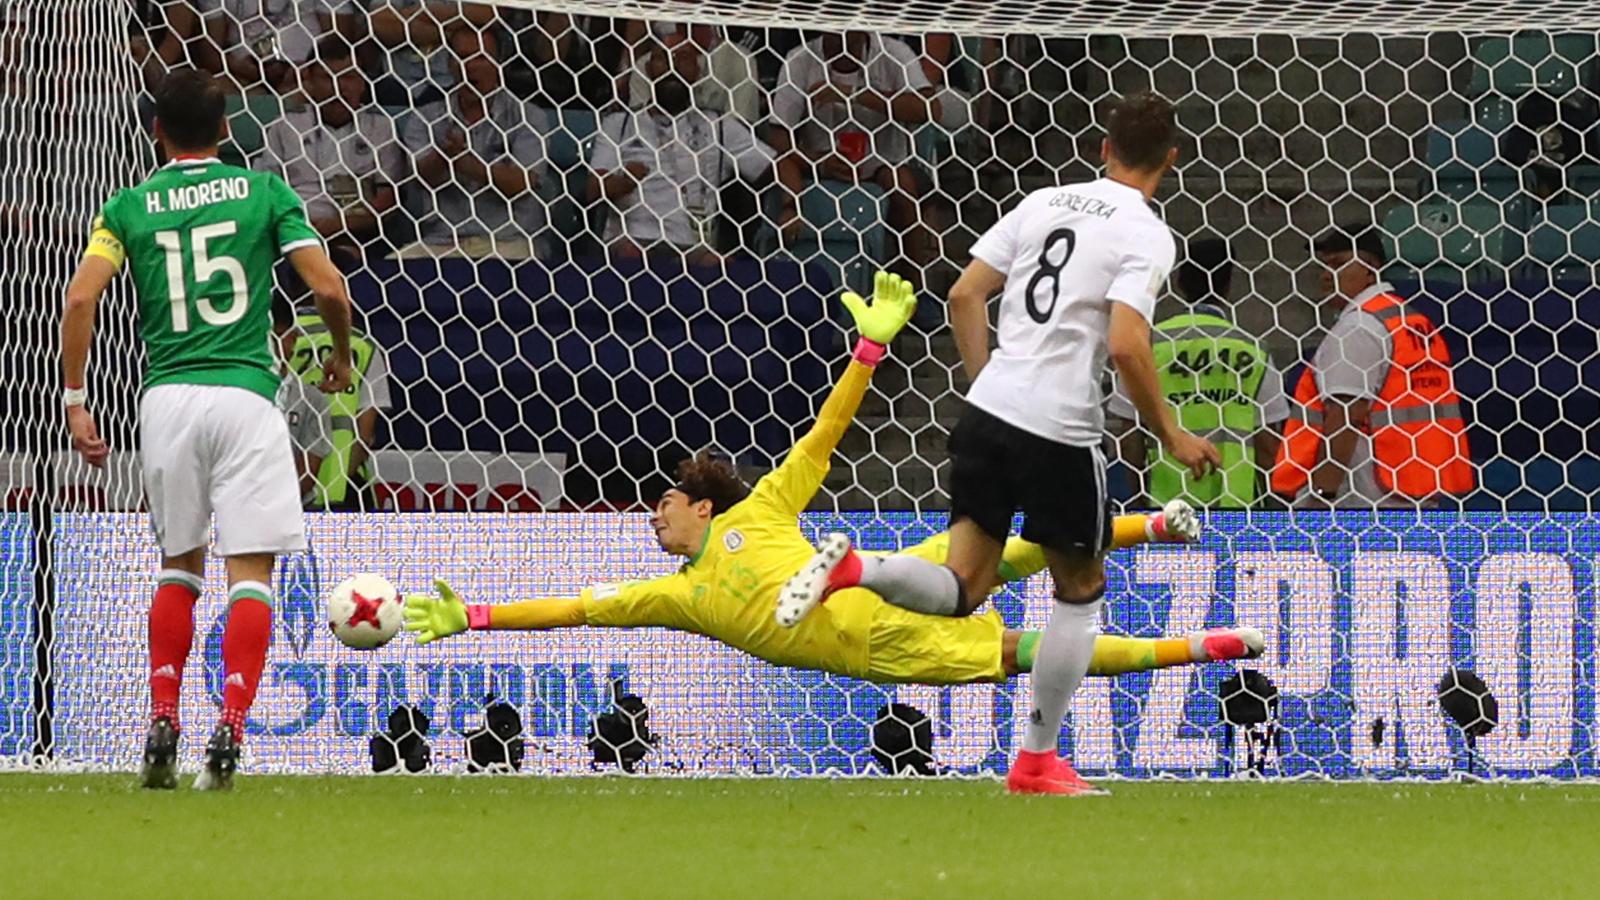 nationalmannschaft deutschland kapitän